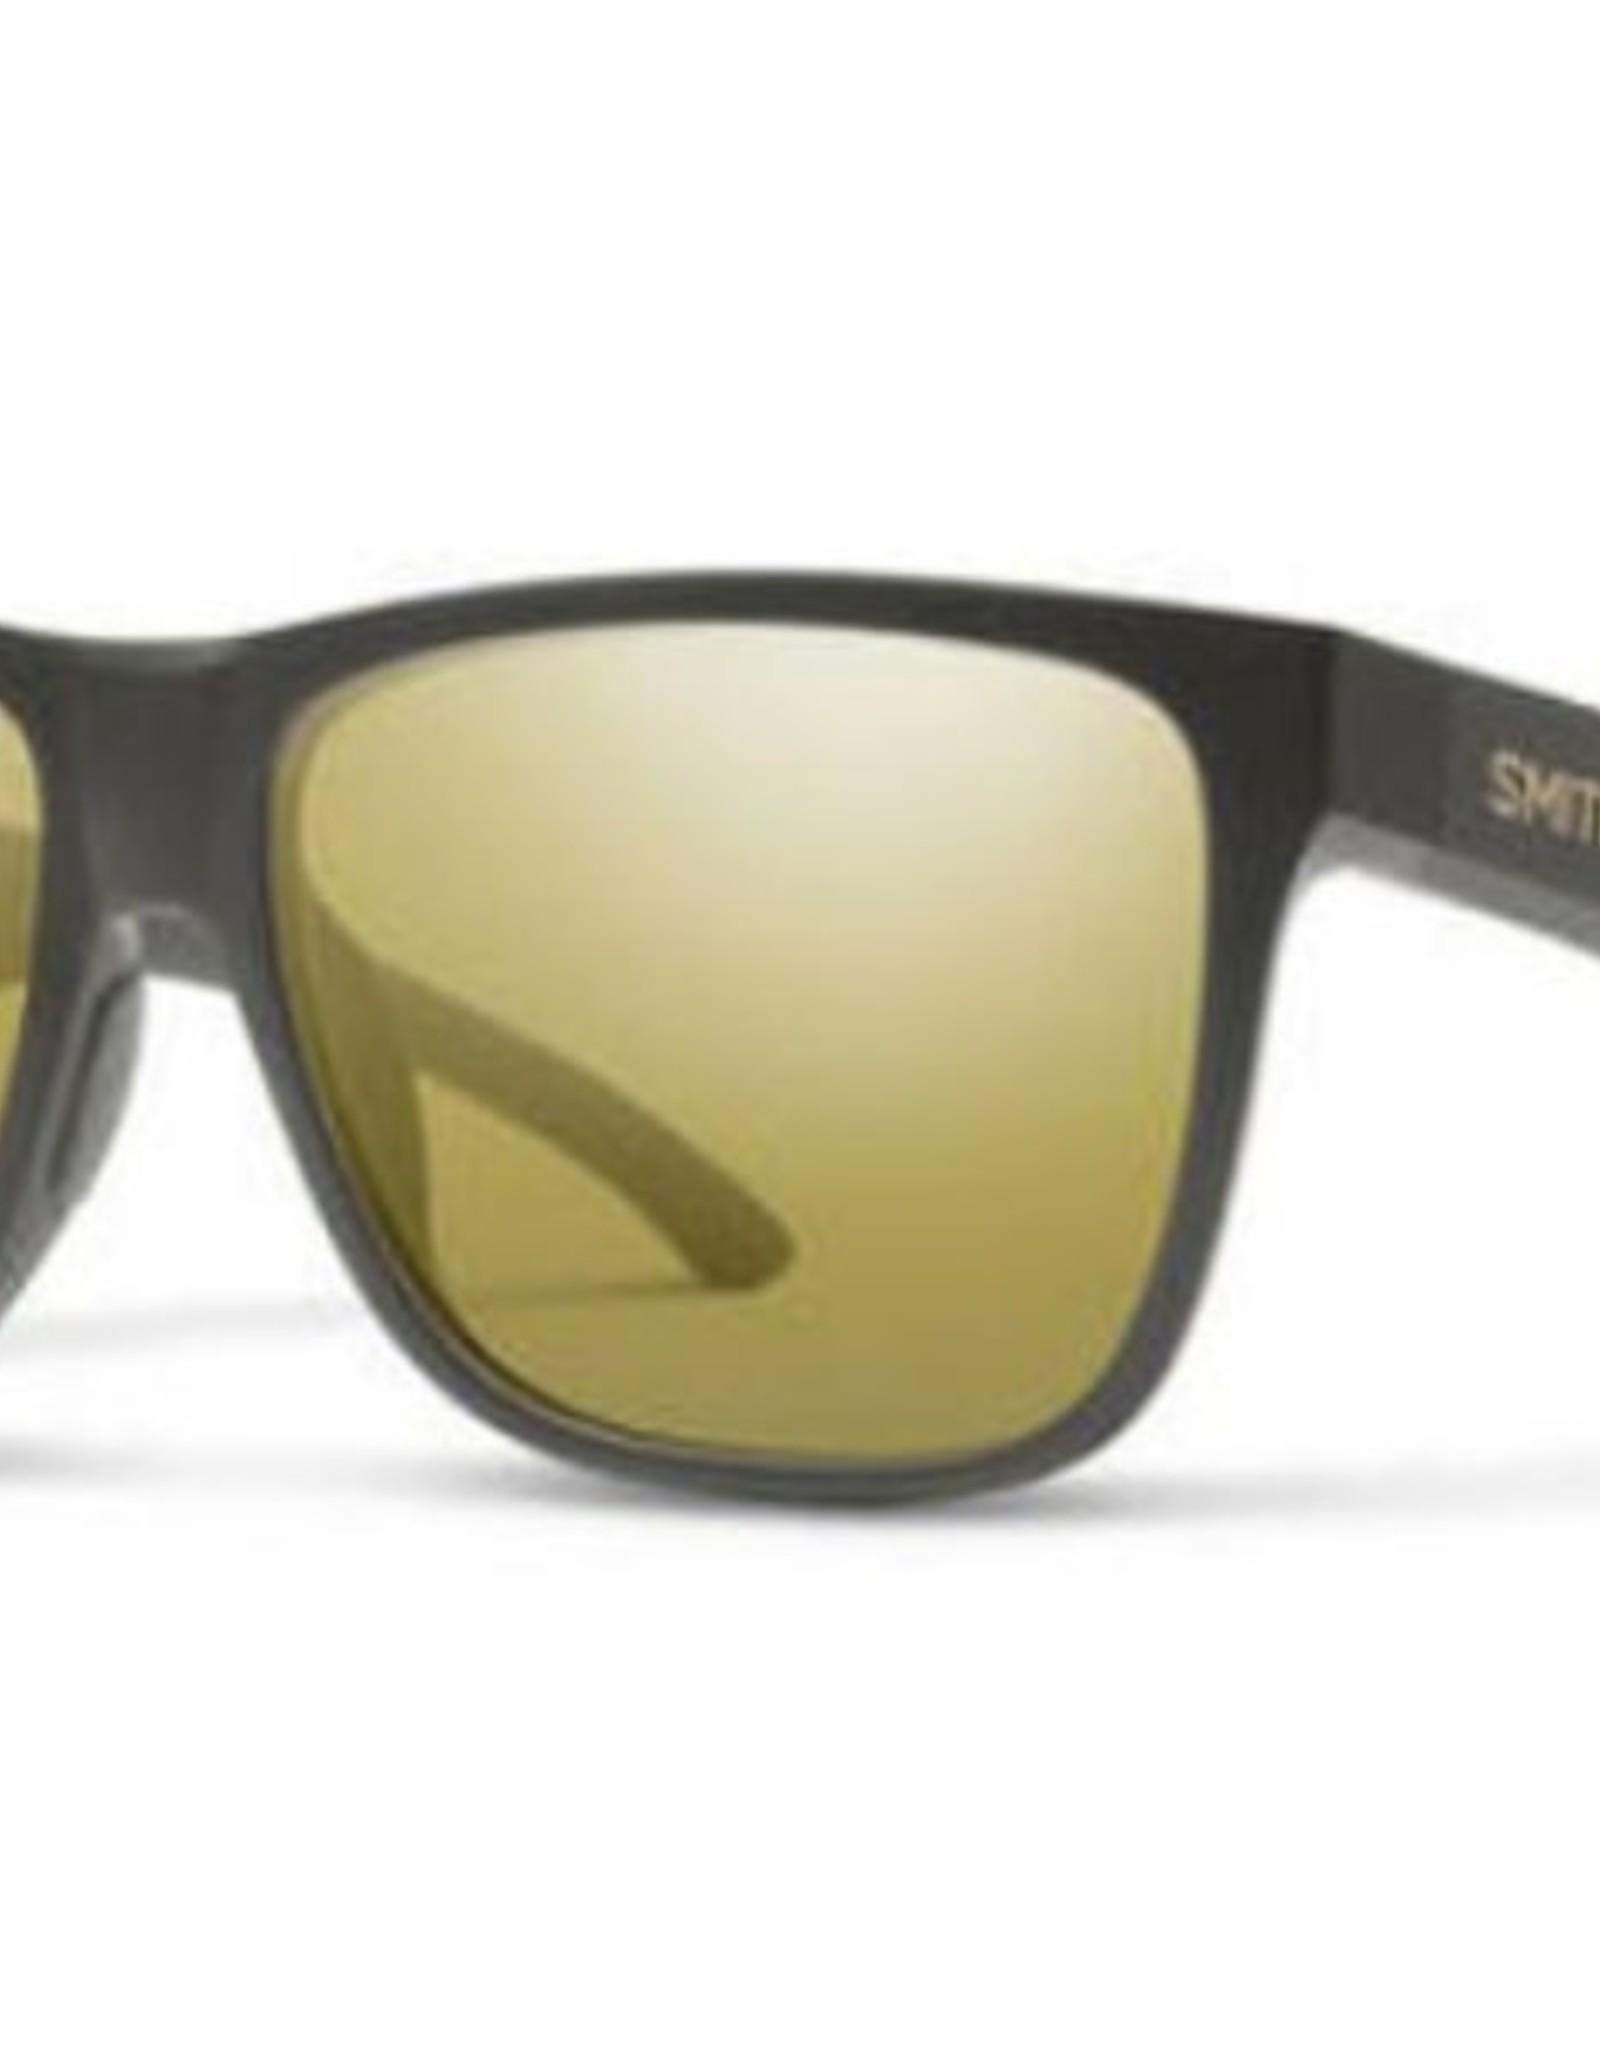 Smith Optics Smith - LOWDOWN XL 2 - Black Gold w/ CP POLAR Black Gold